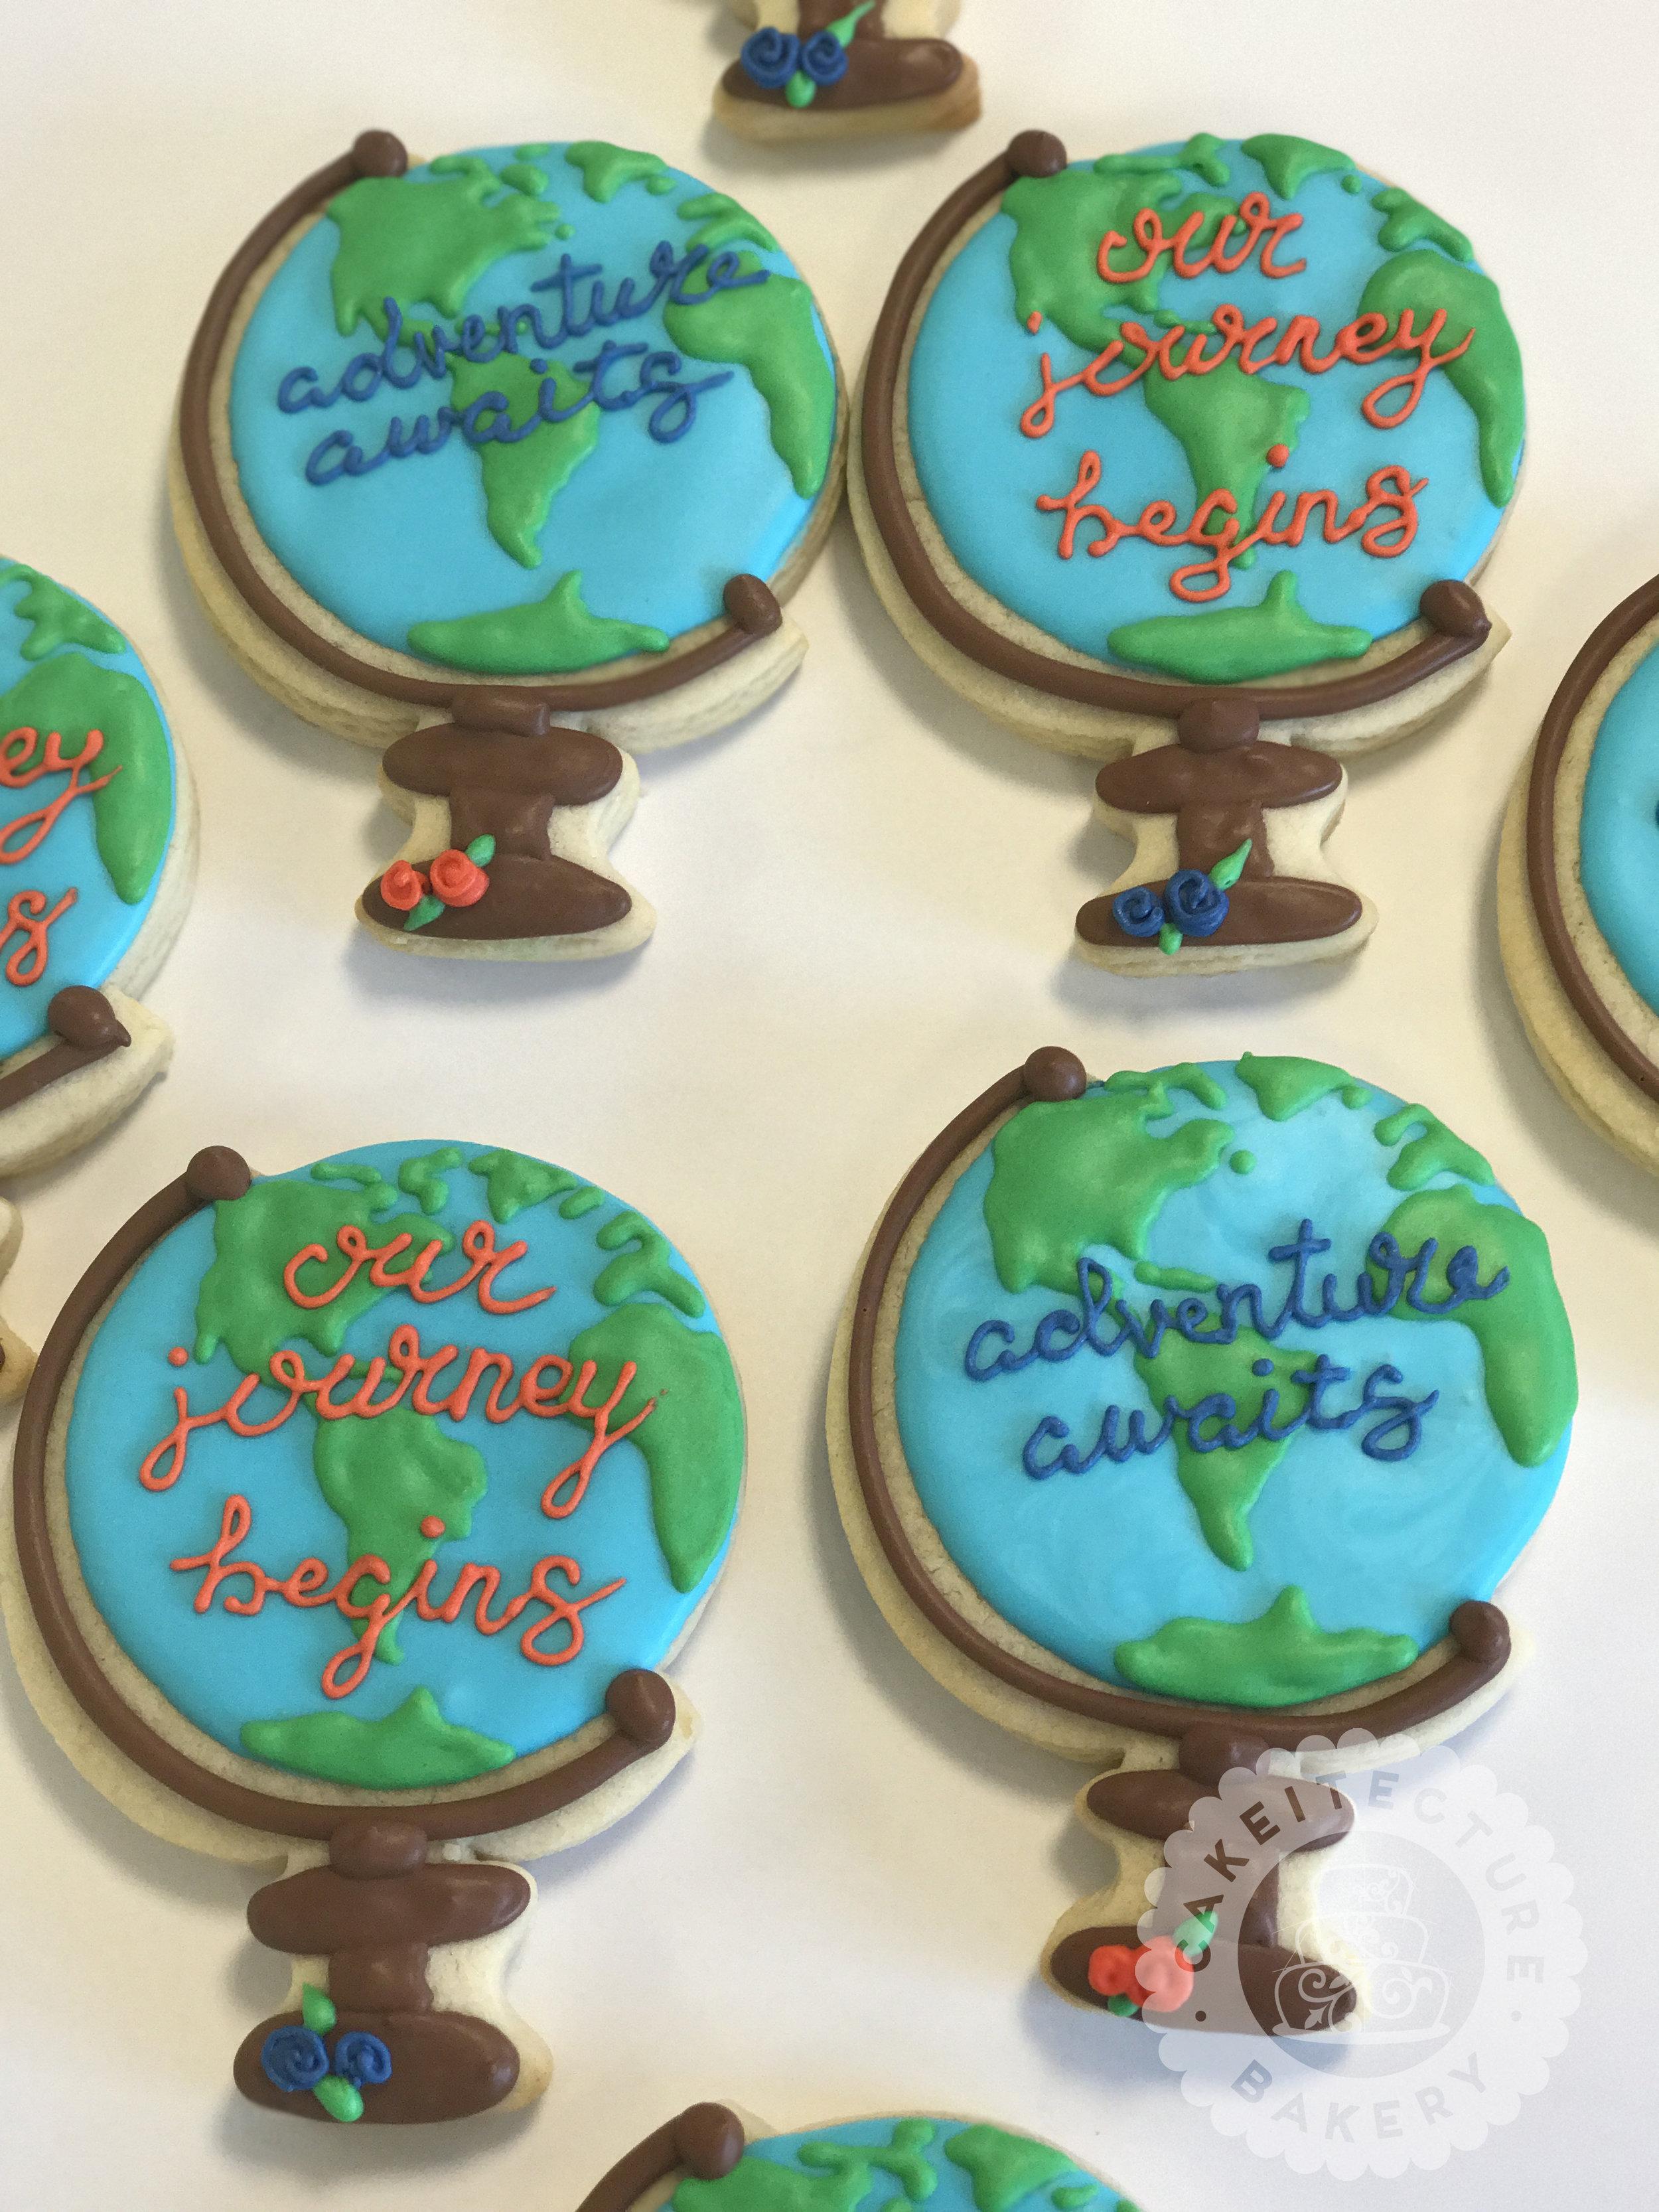 Cakeitecture Bakery 1744 globe cookies.jpg